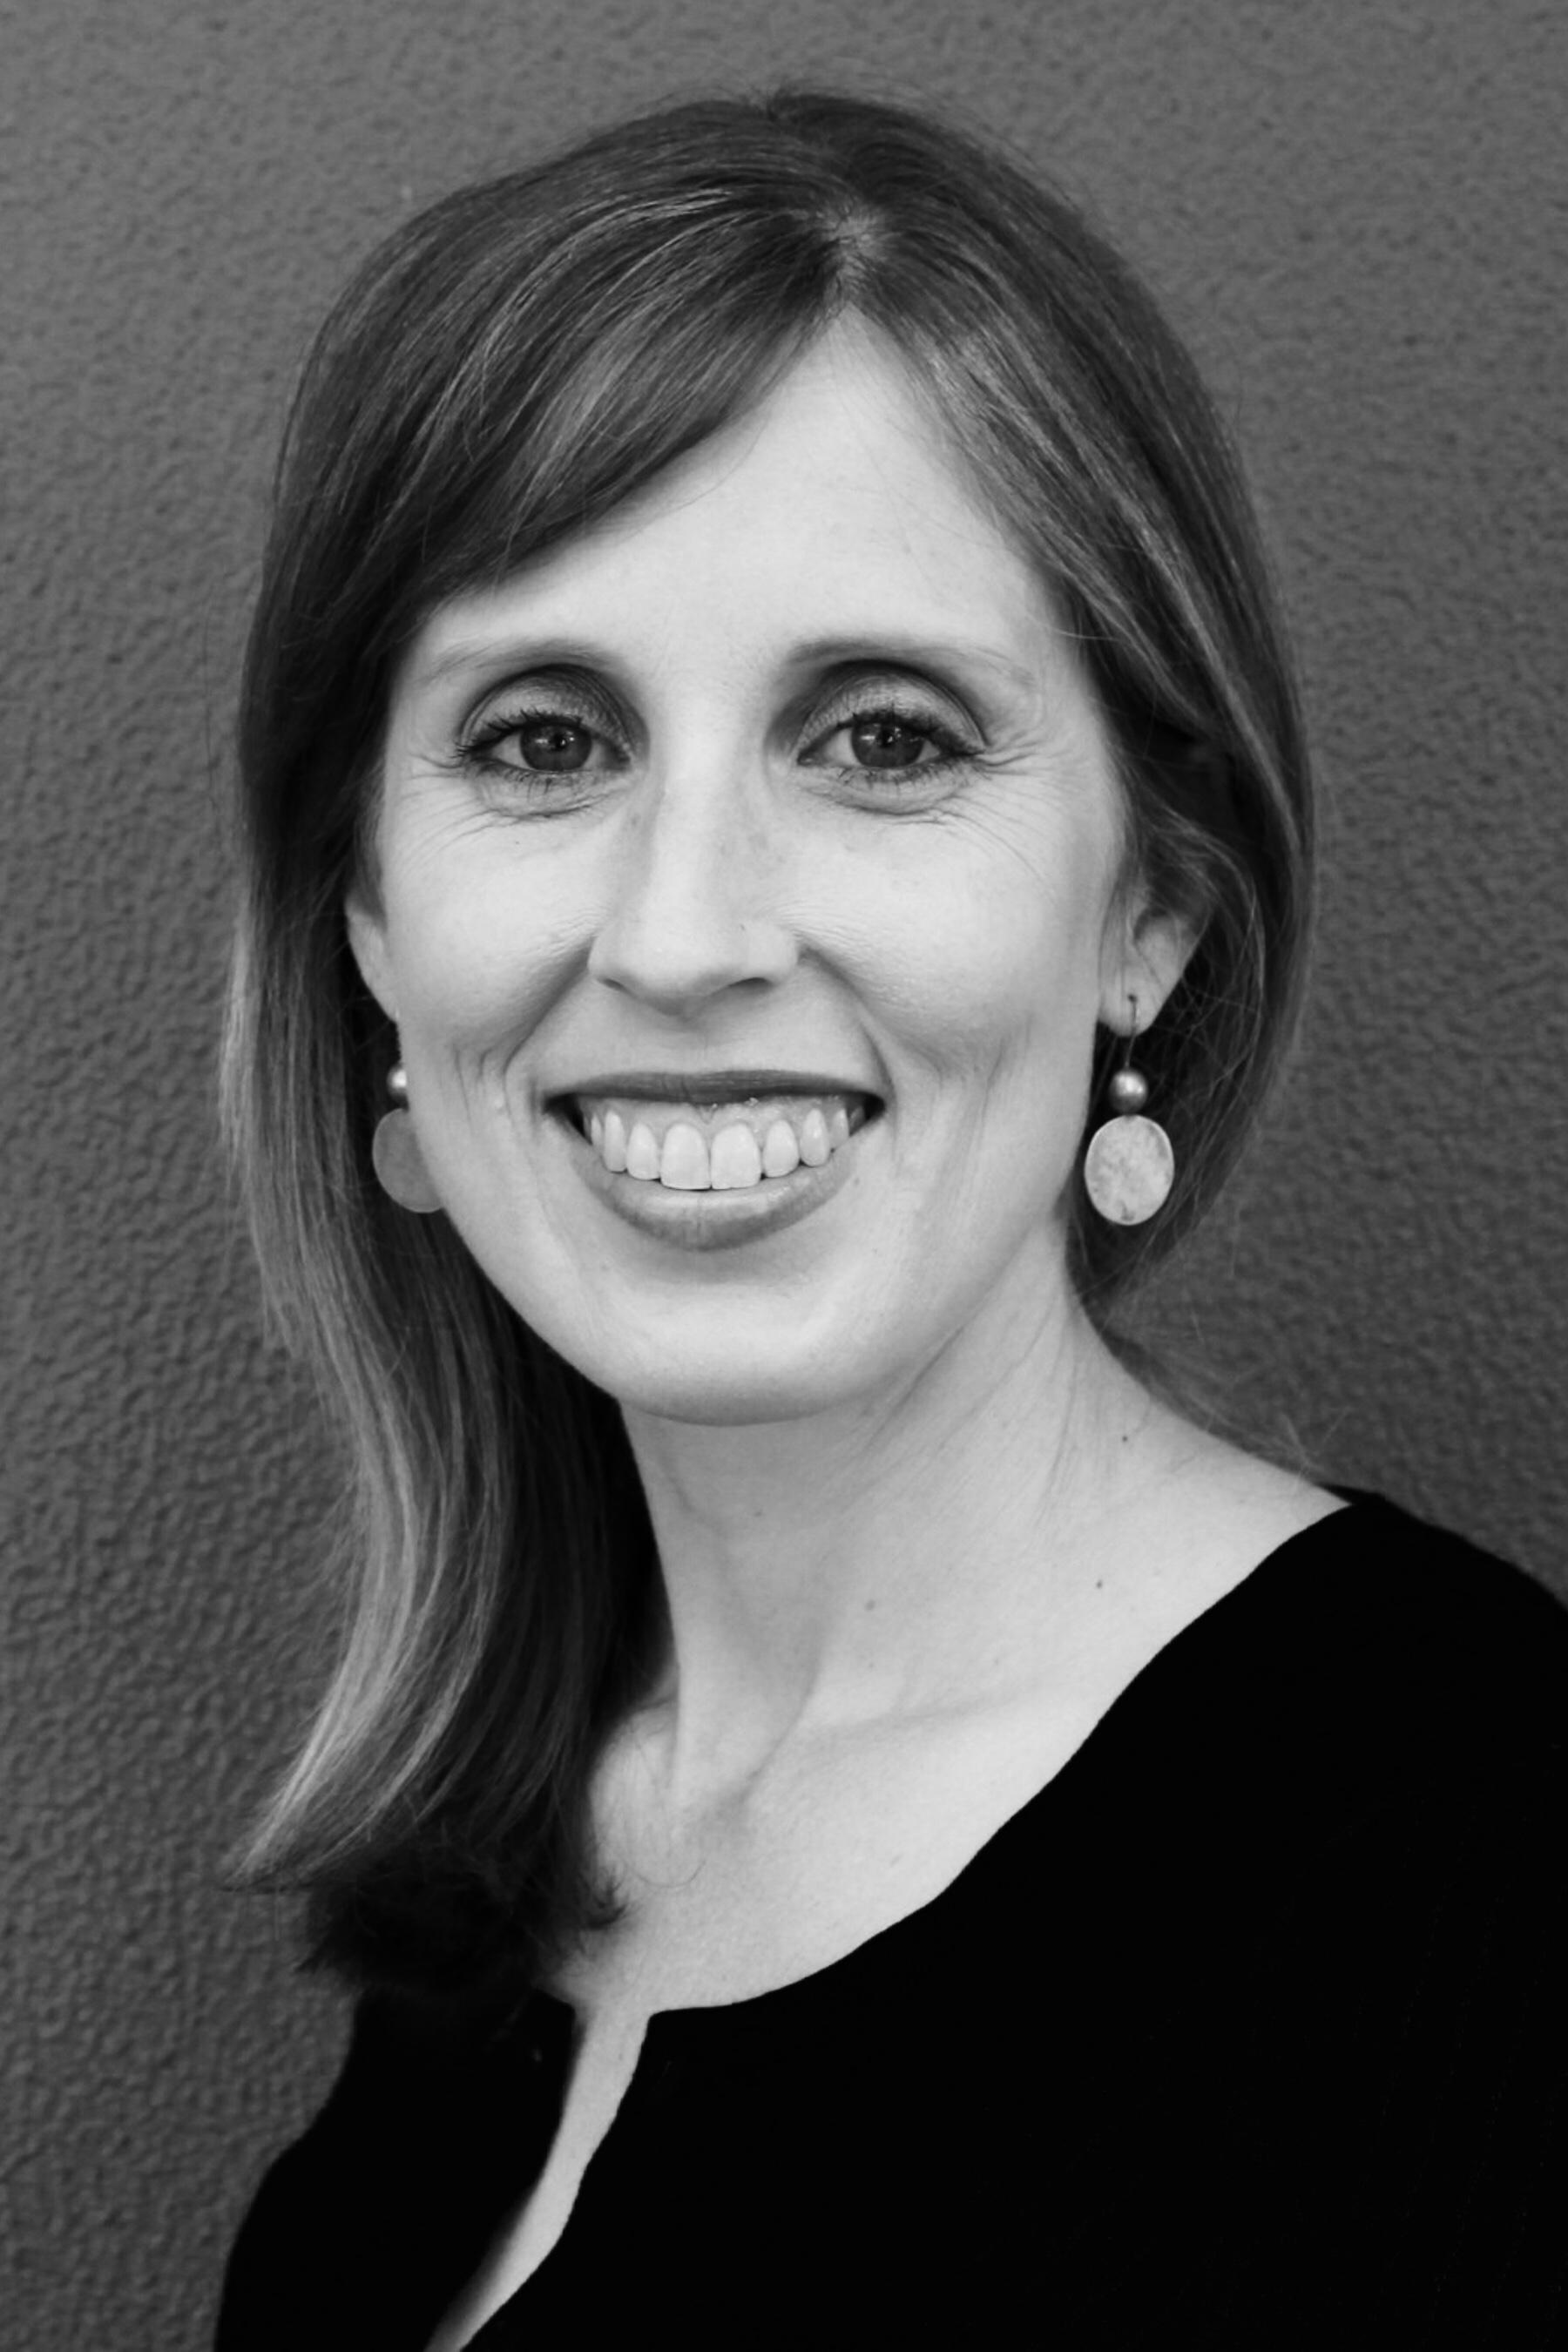 Associate Professor Jane Rachael Kohlhoff